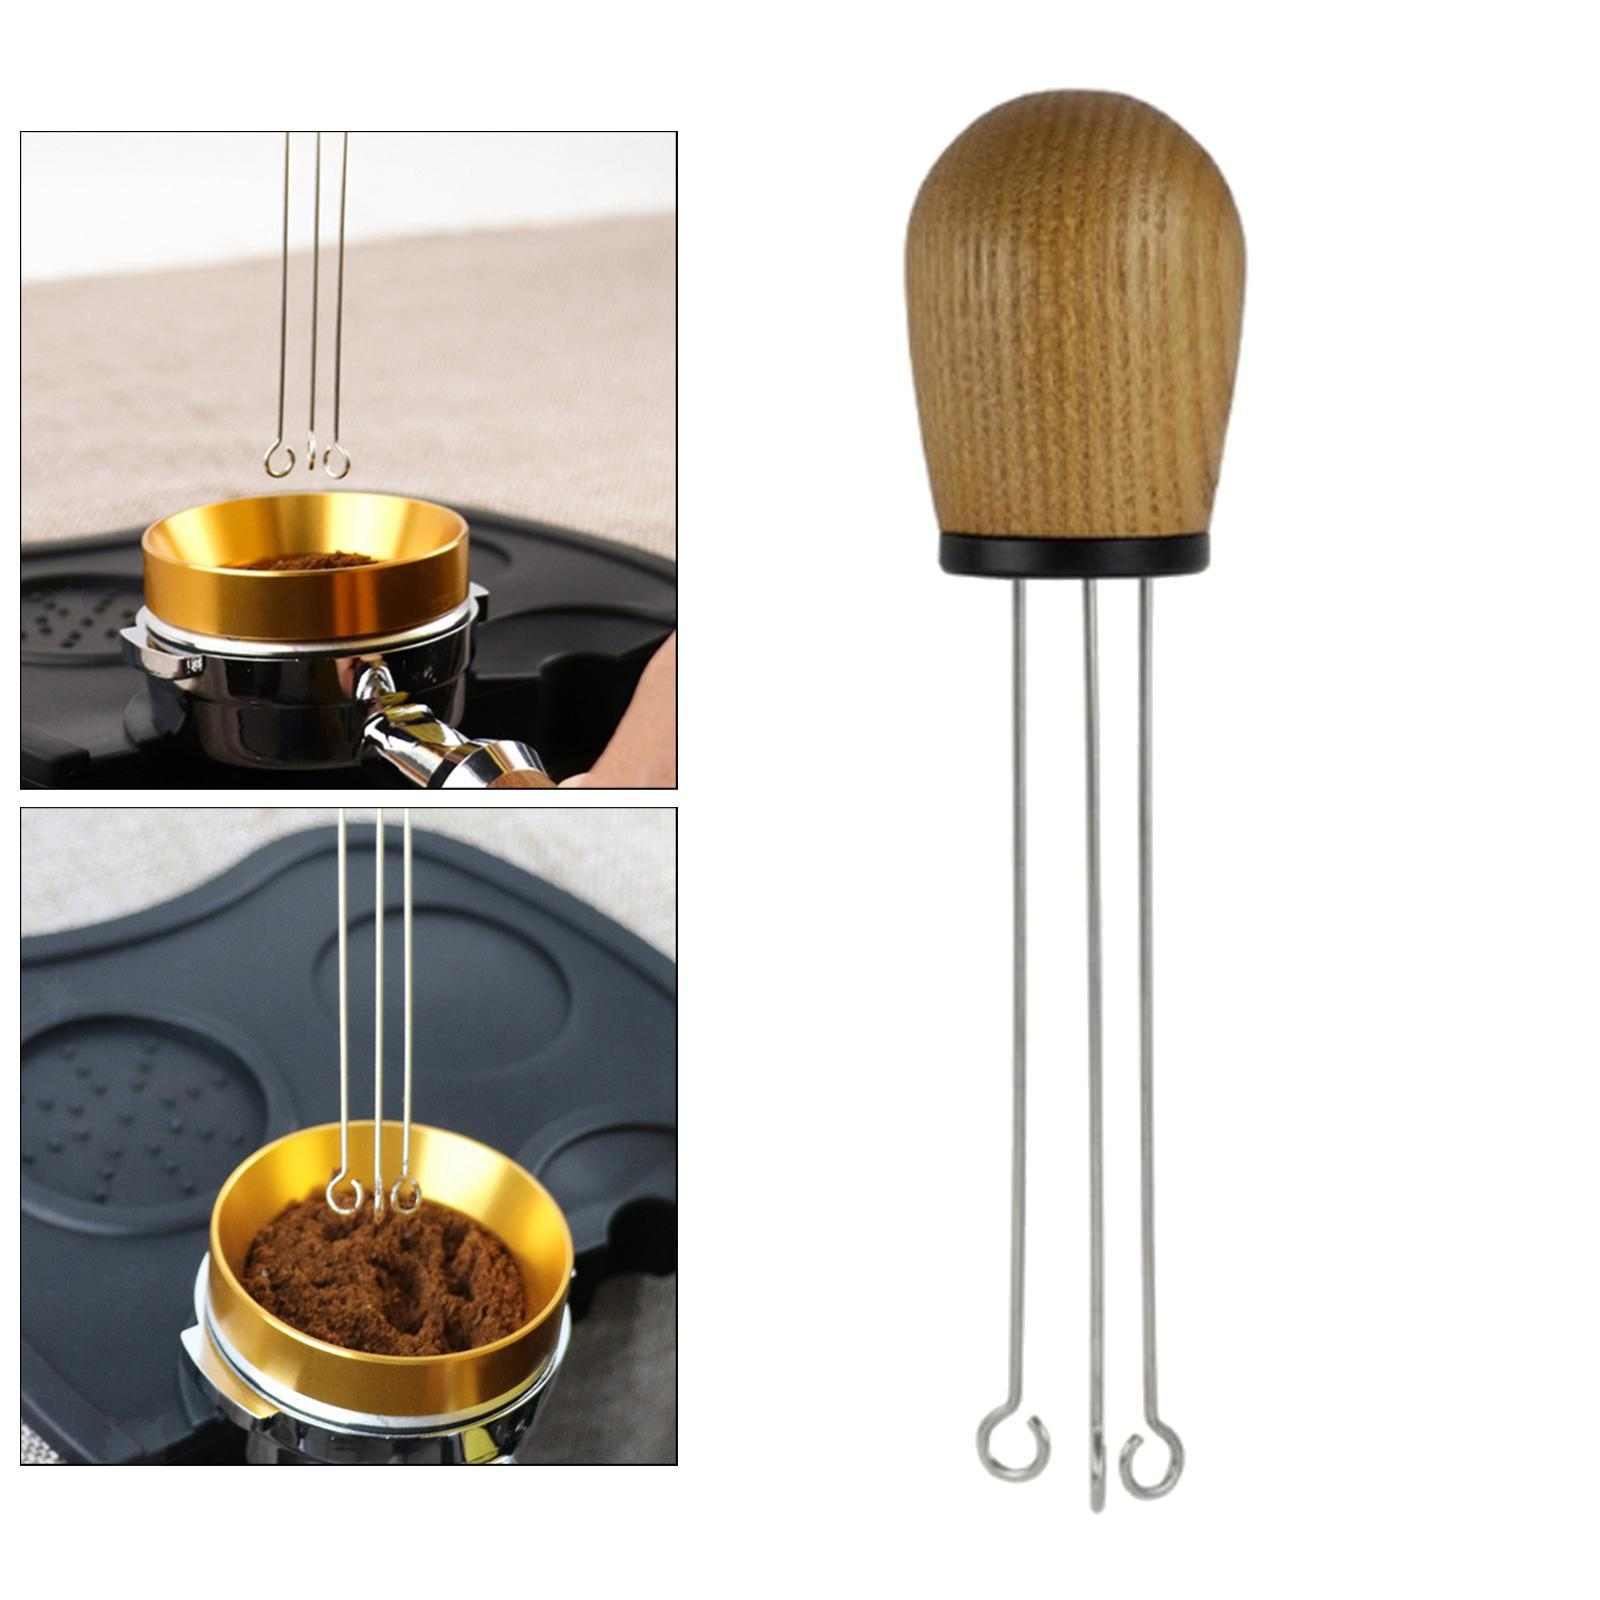 Indexbild 3 - Edelstahl Espresso Tamper Leveler Nadel Typ Pulver Händler